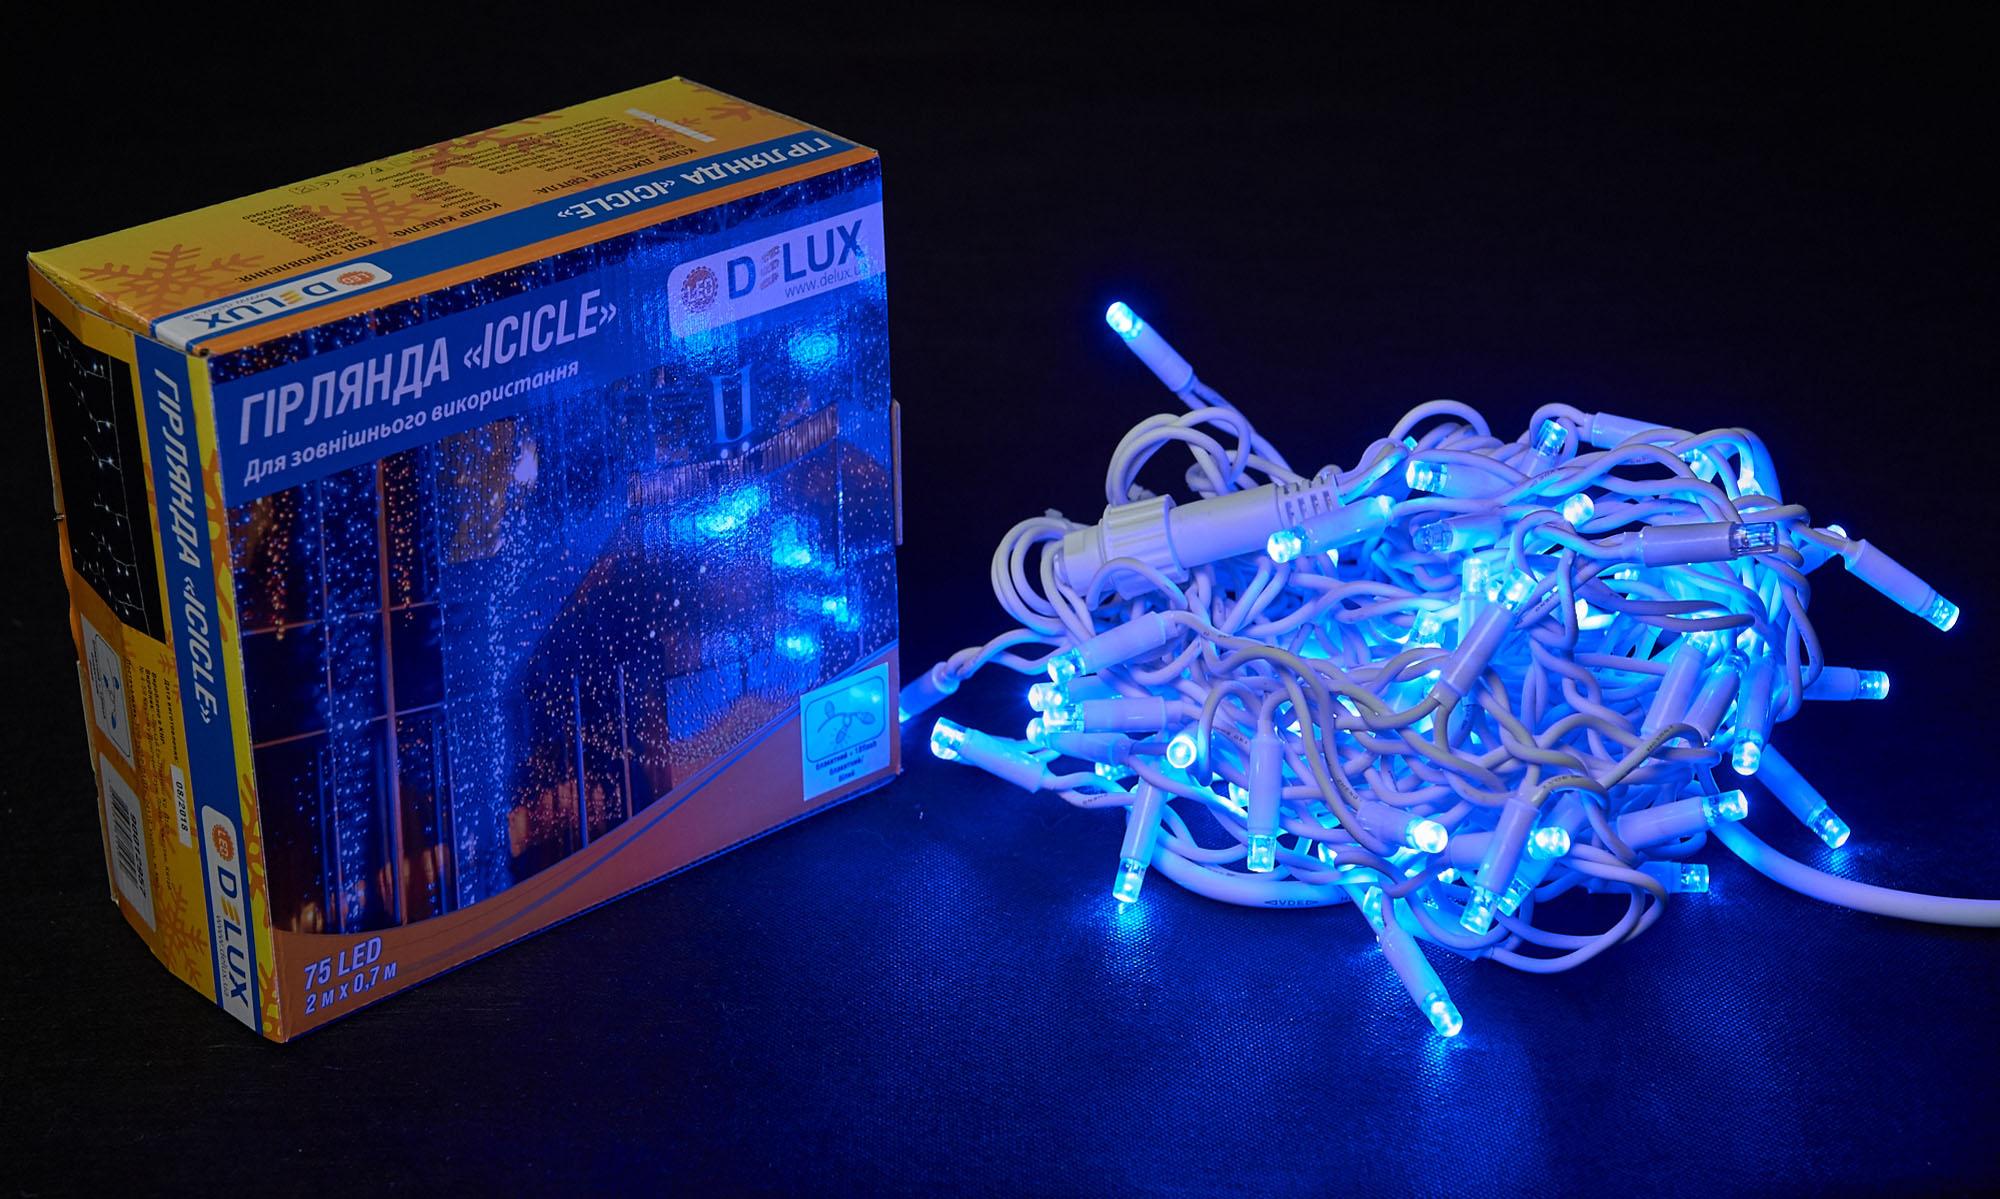 Гирлянда внешняя DELUX ICICLE 75 LED бахрома 2x1m 18 flash синий/белый IP44 EN